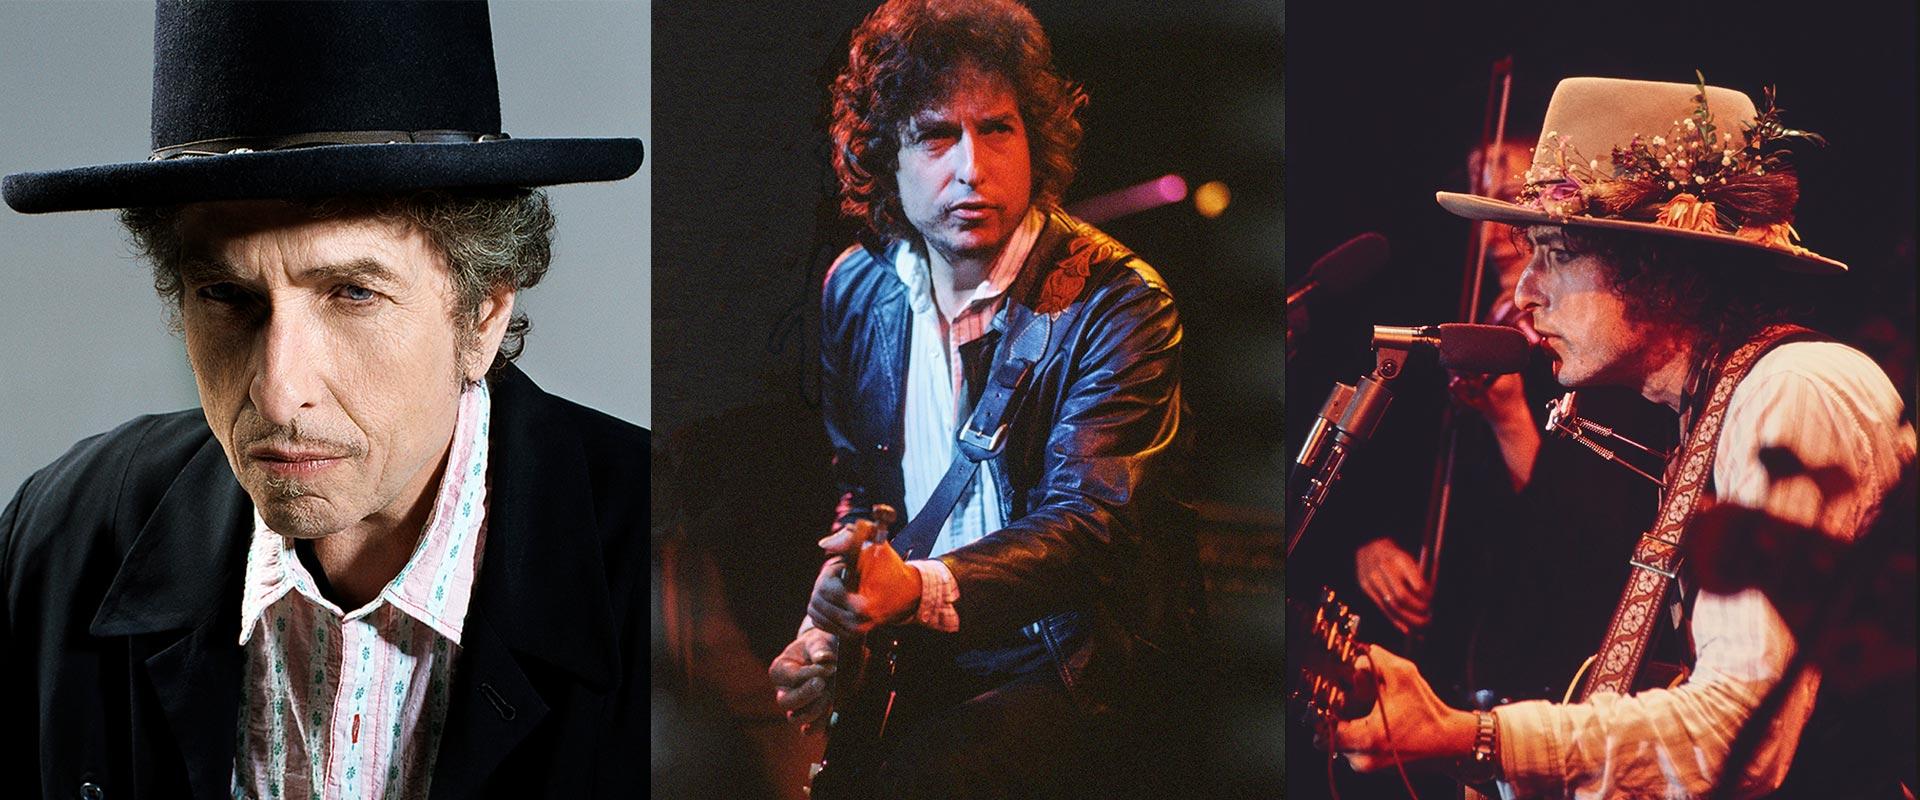 "Bob Dylan Porträt (Foto: William Claxton) / ""Trouble No More"" (Foto: Baron Wolman) / ""Rolling Thunder Revue"" (Foto: Ken Regan) © Sony BMG"